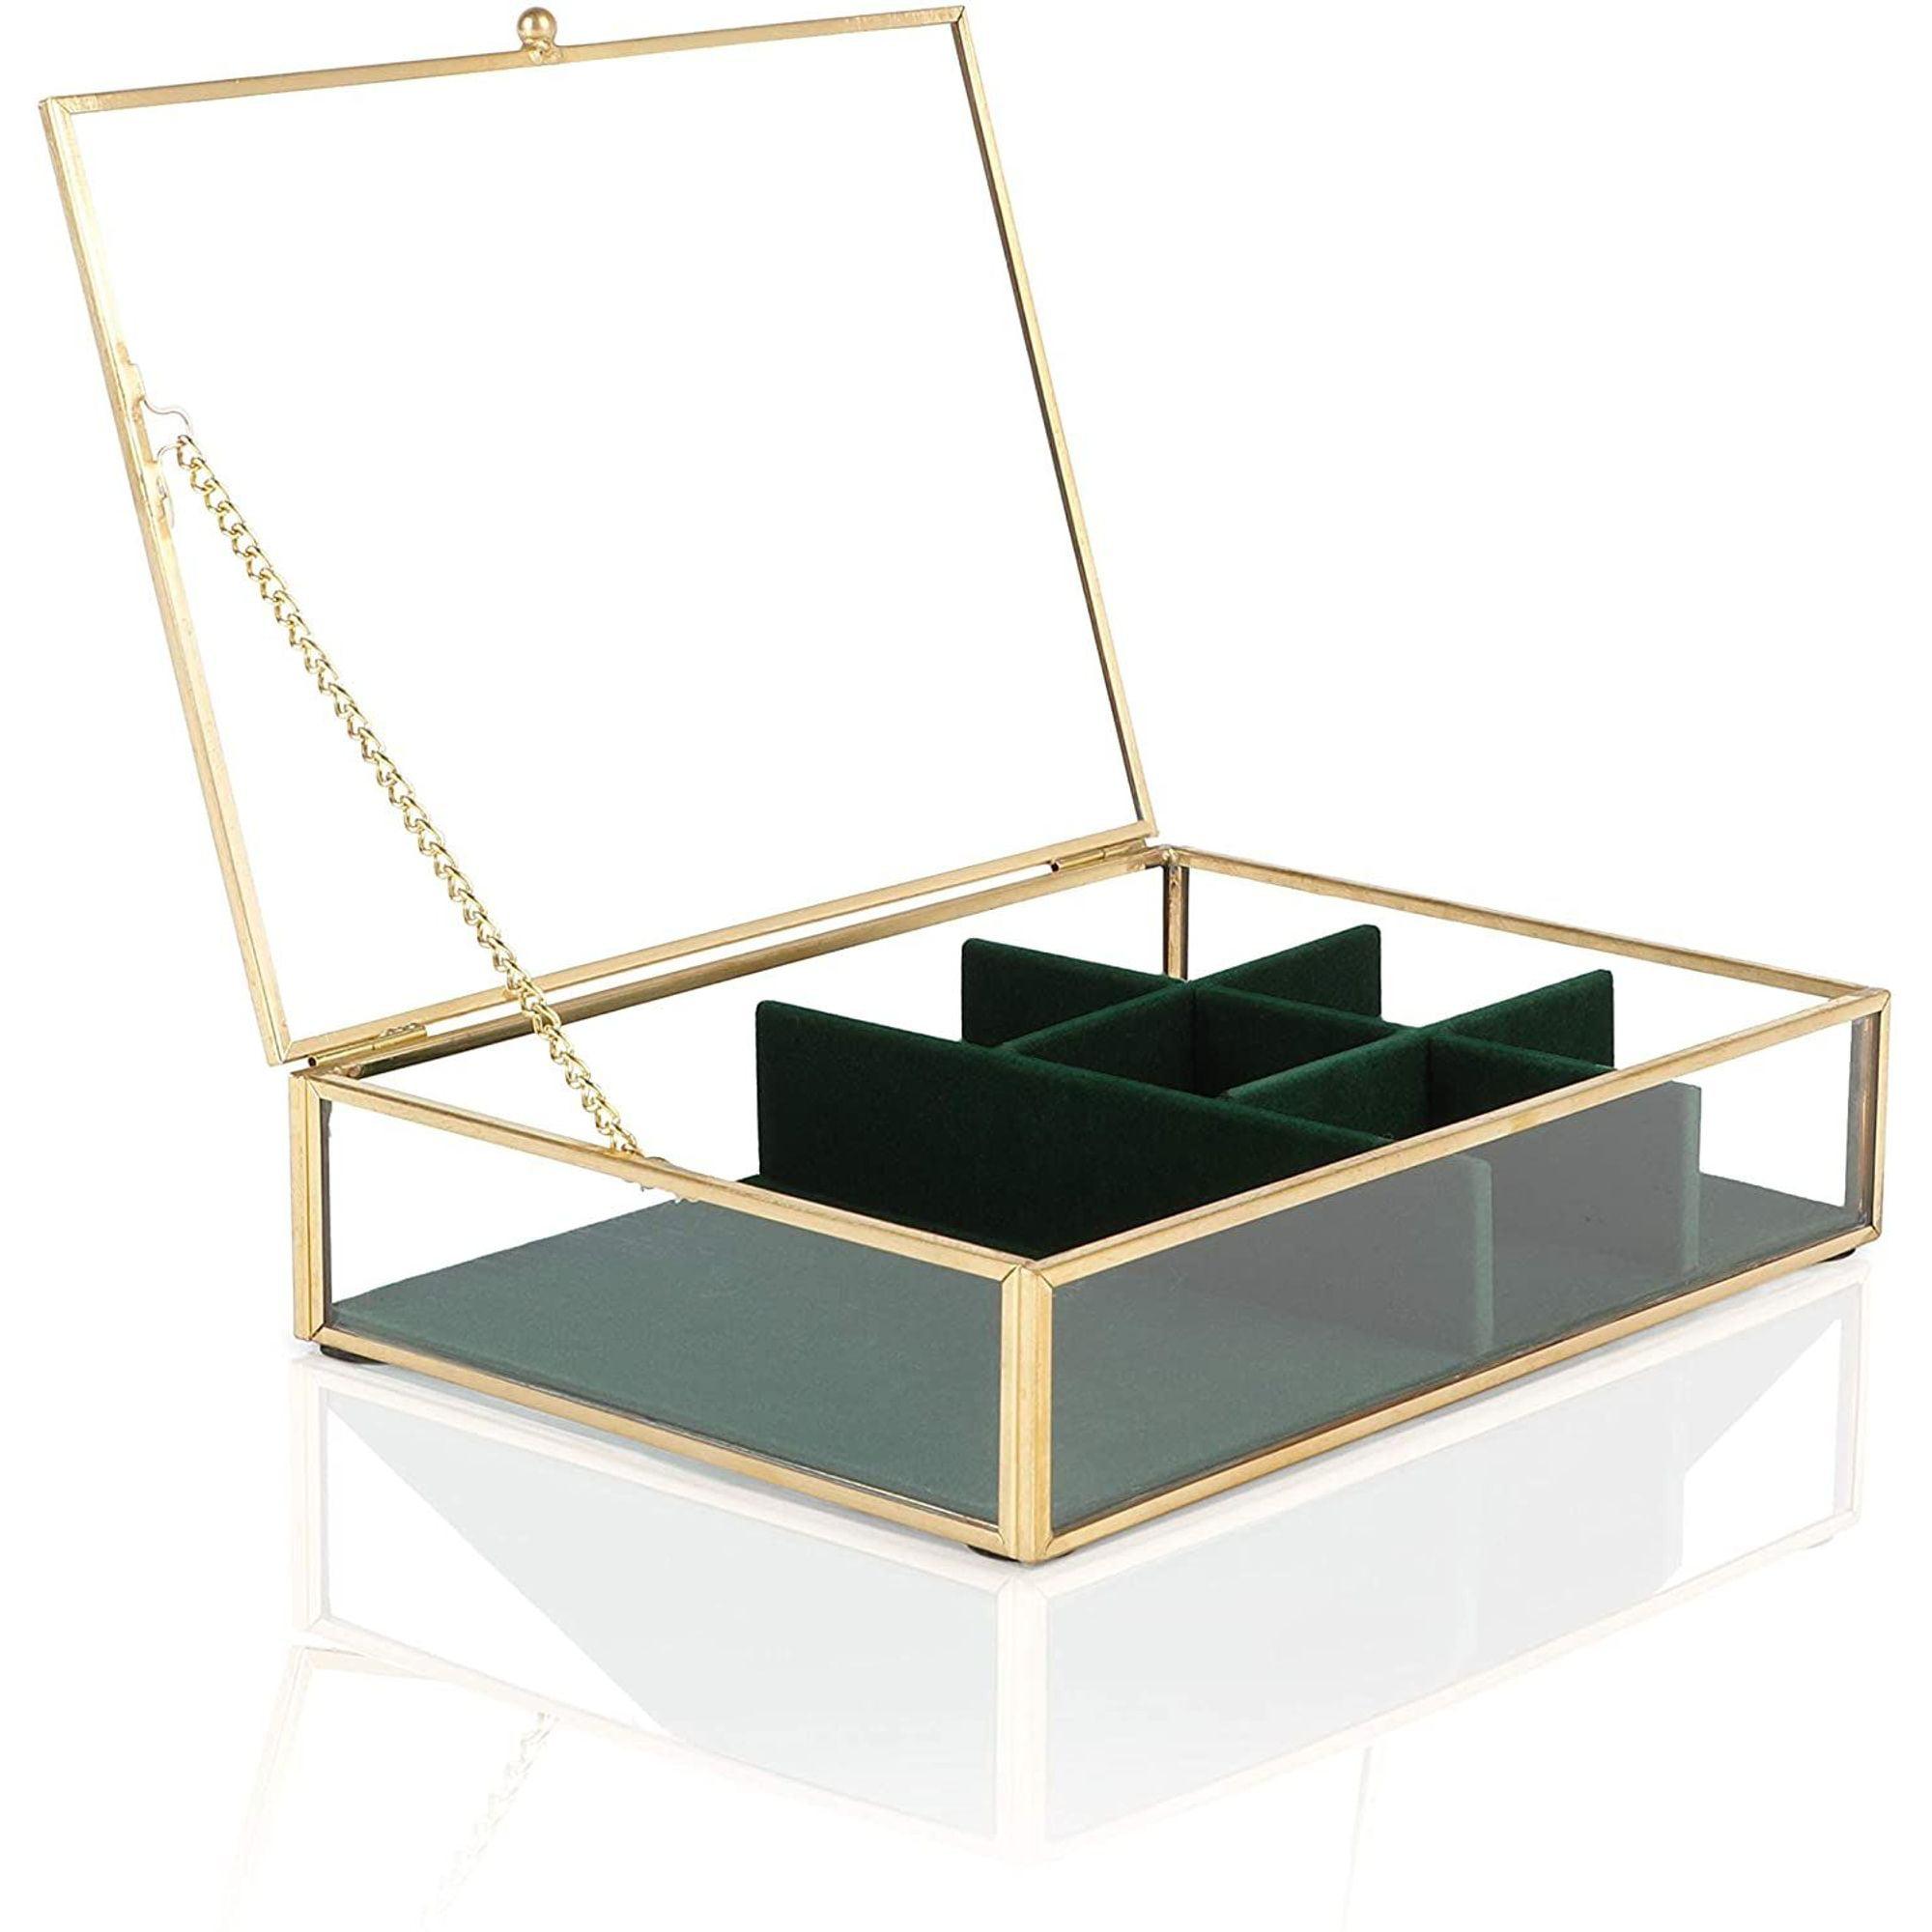 Juvale Glass Jewelry Storage Box With Green Velvet Tray Organizer Lid Clear Gold Walmart Com Walmart Com